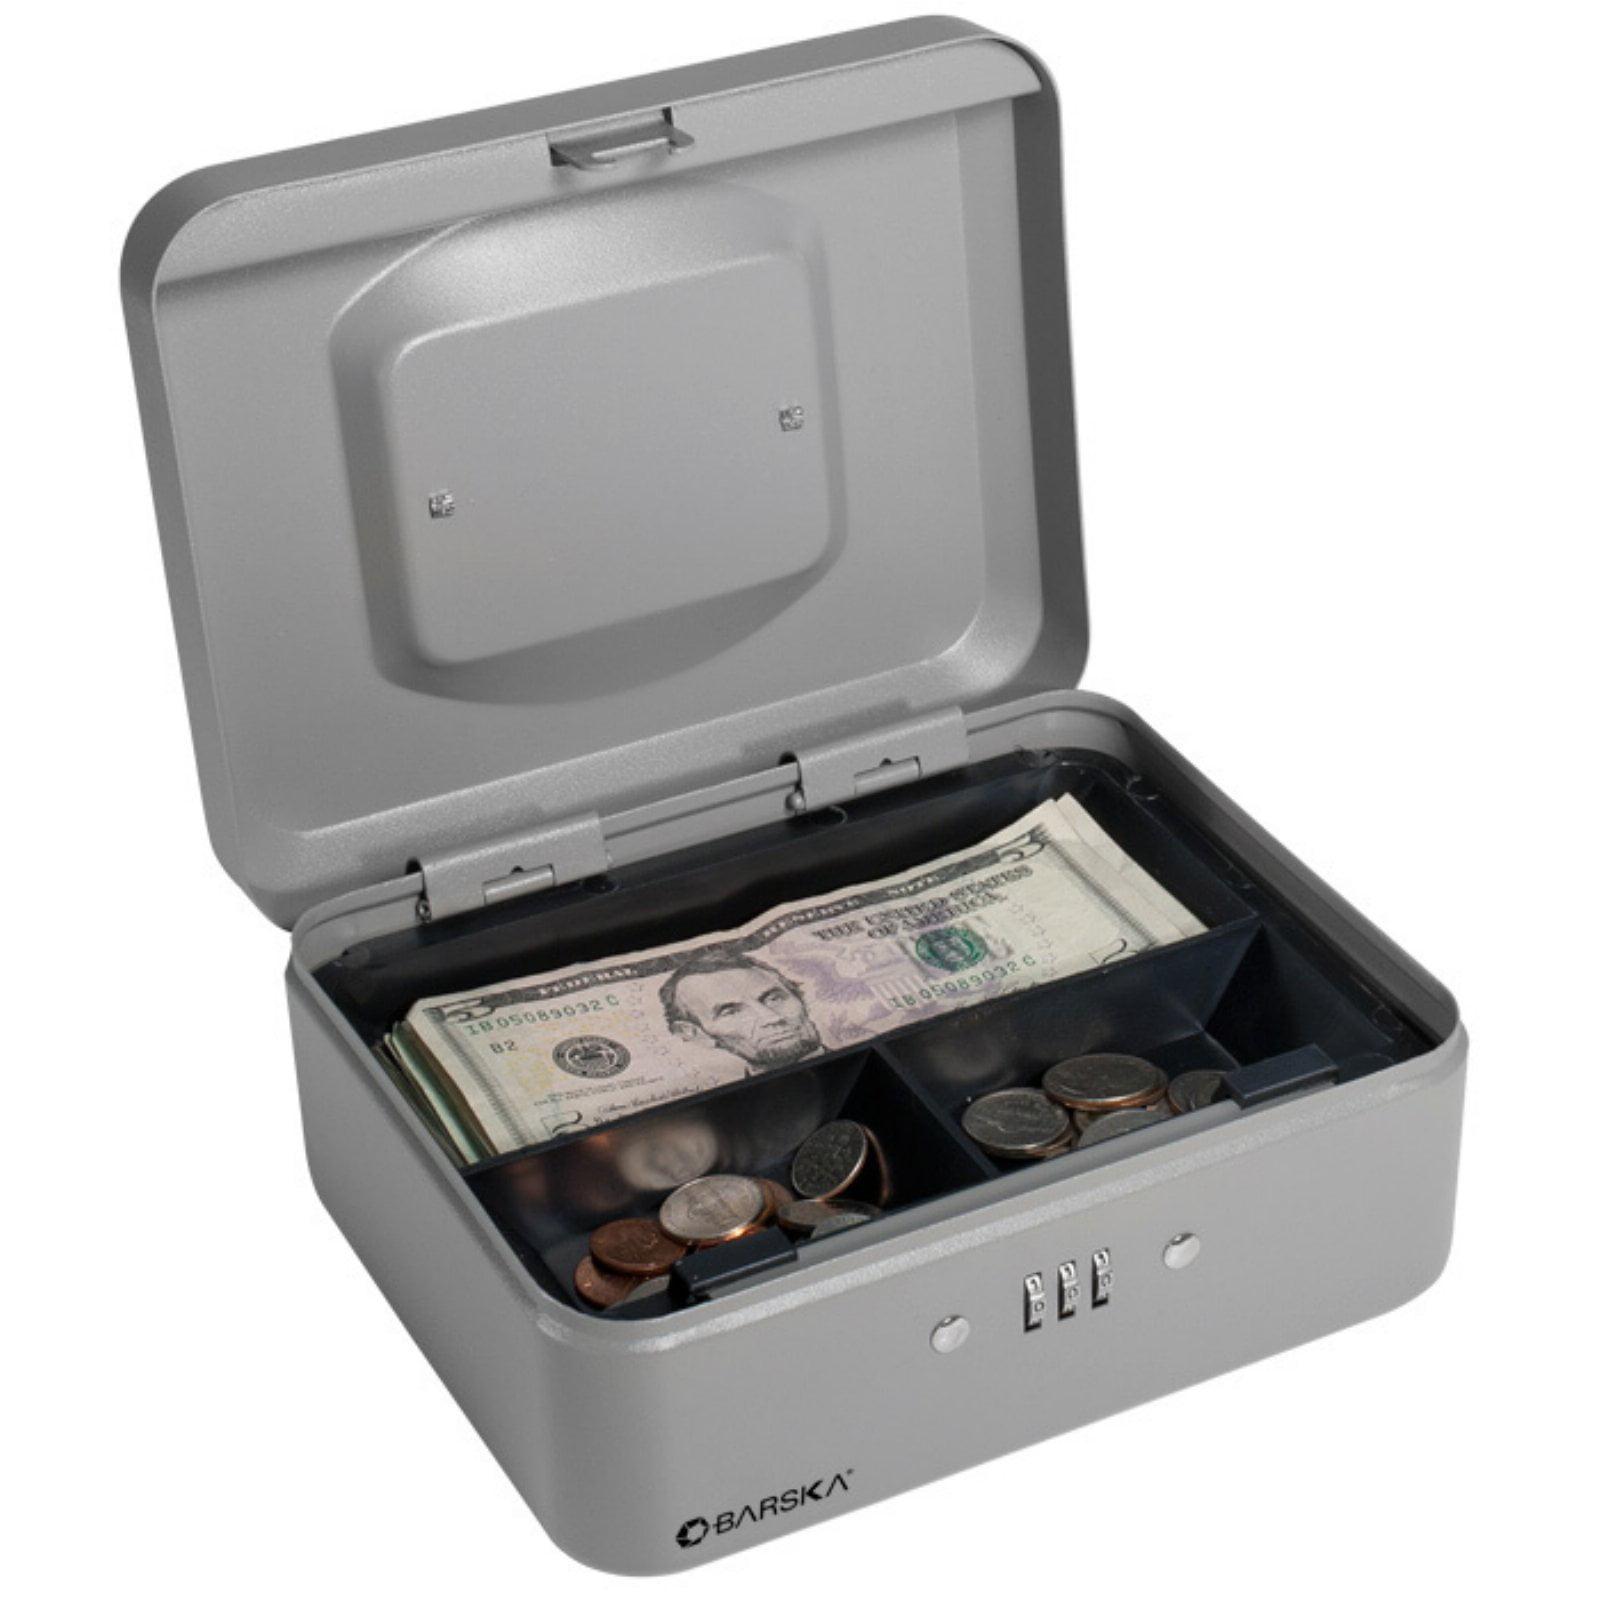 Barska 8 Inch Cash Box with Combination Lock by Barska